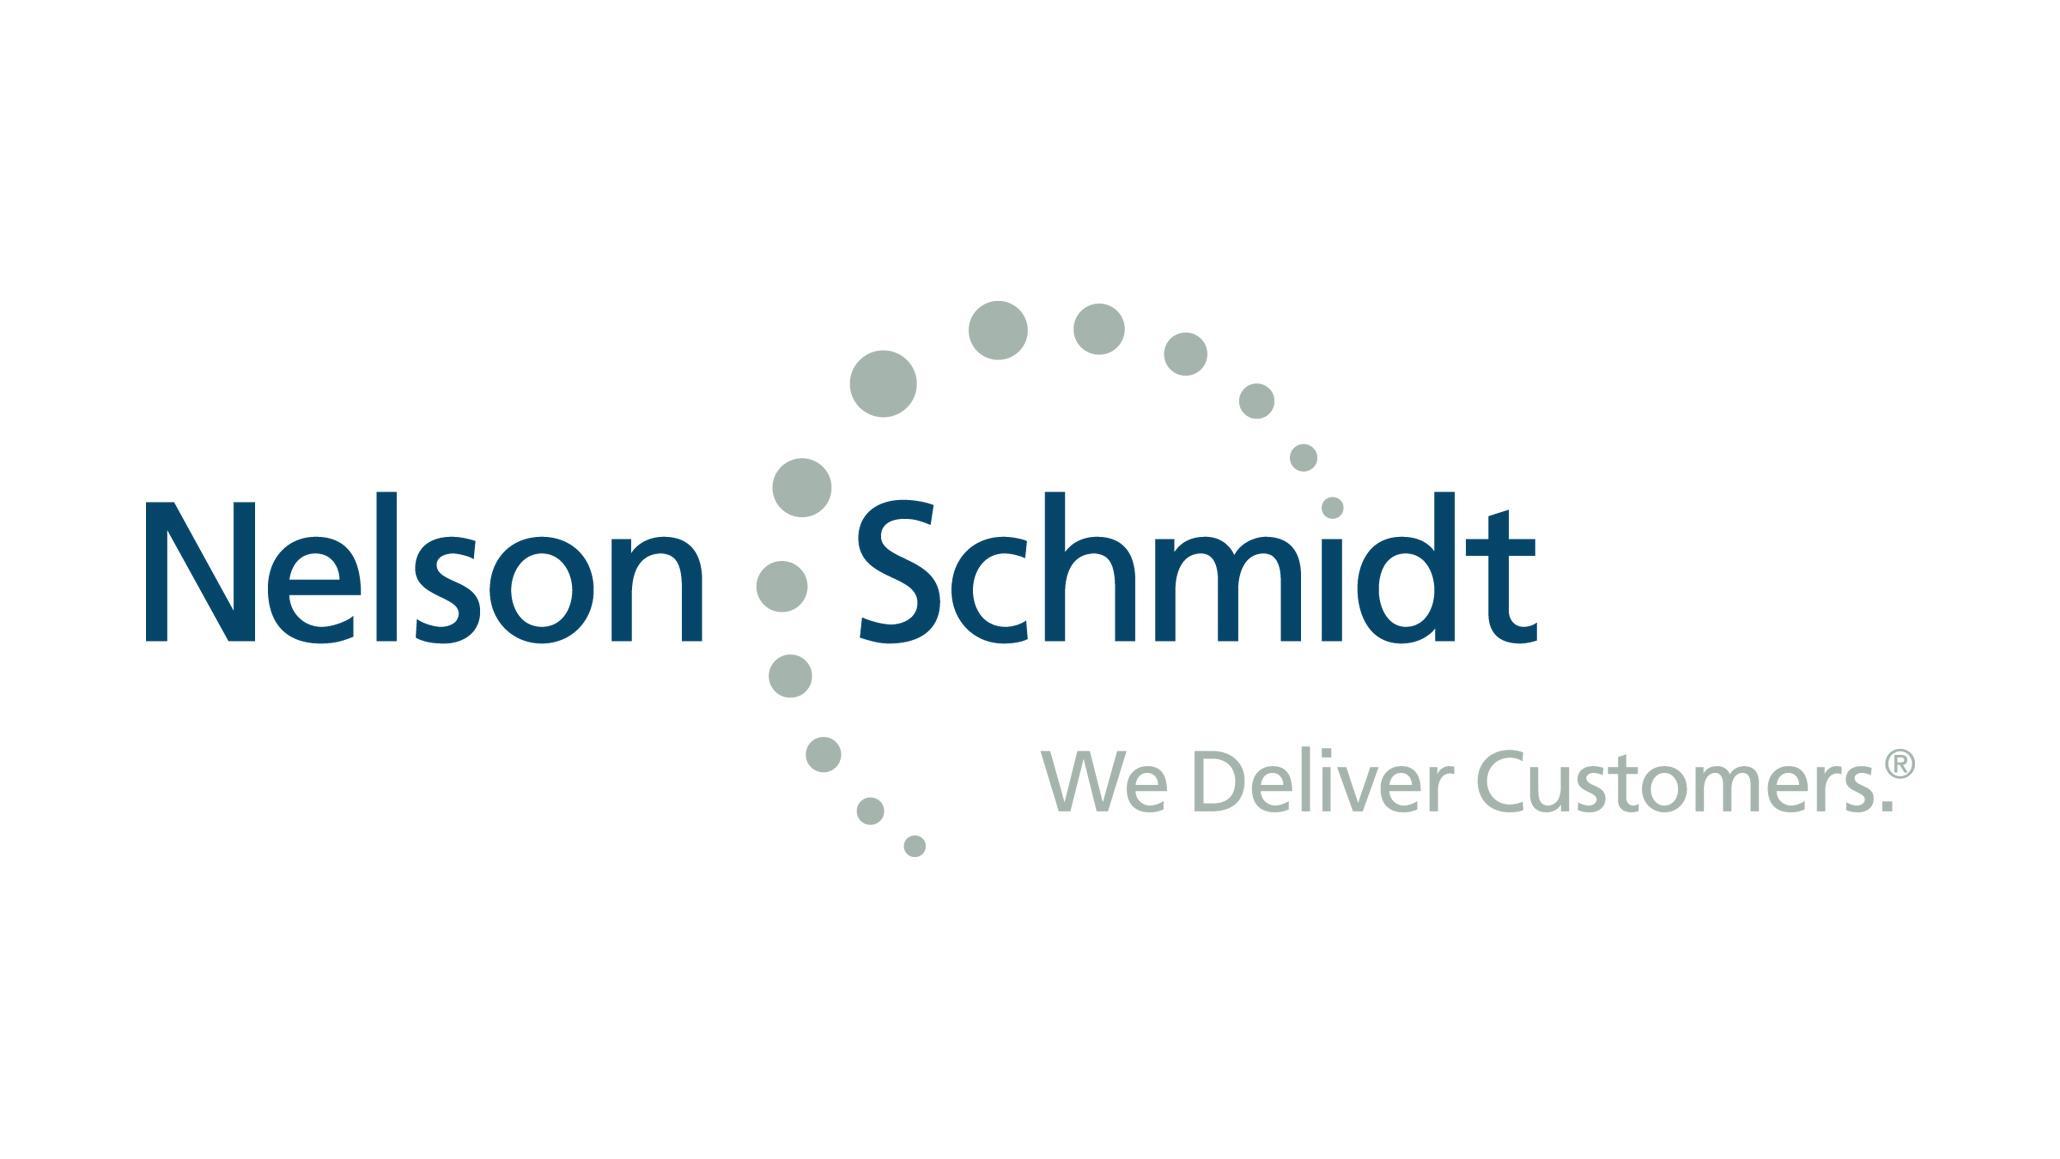 Nelson Schmidt Inc.